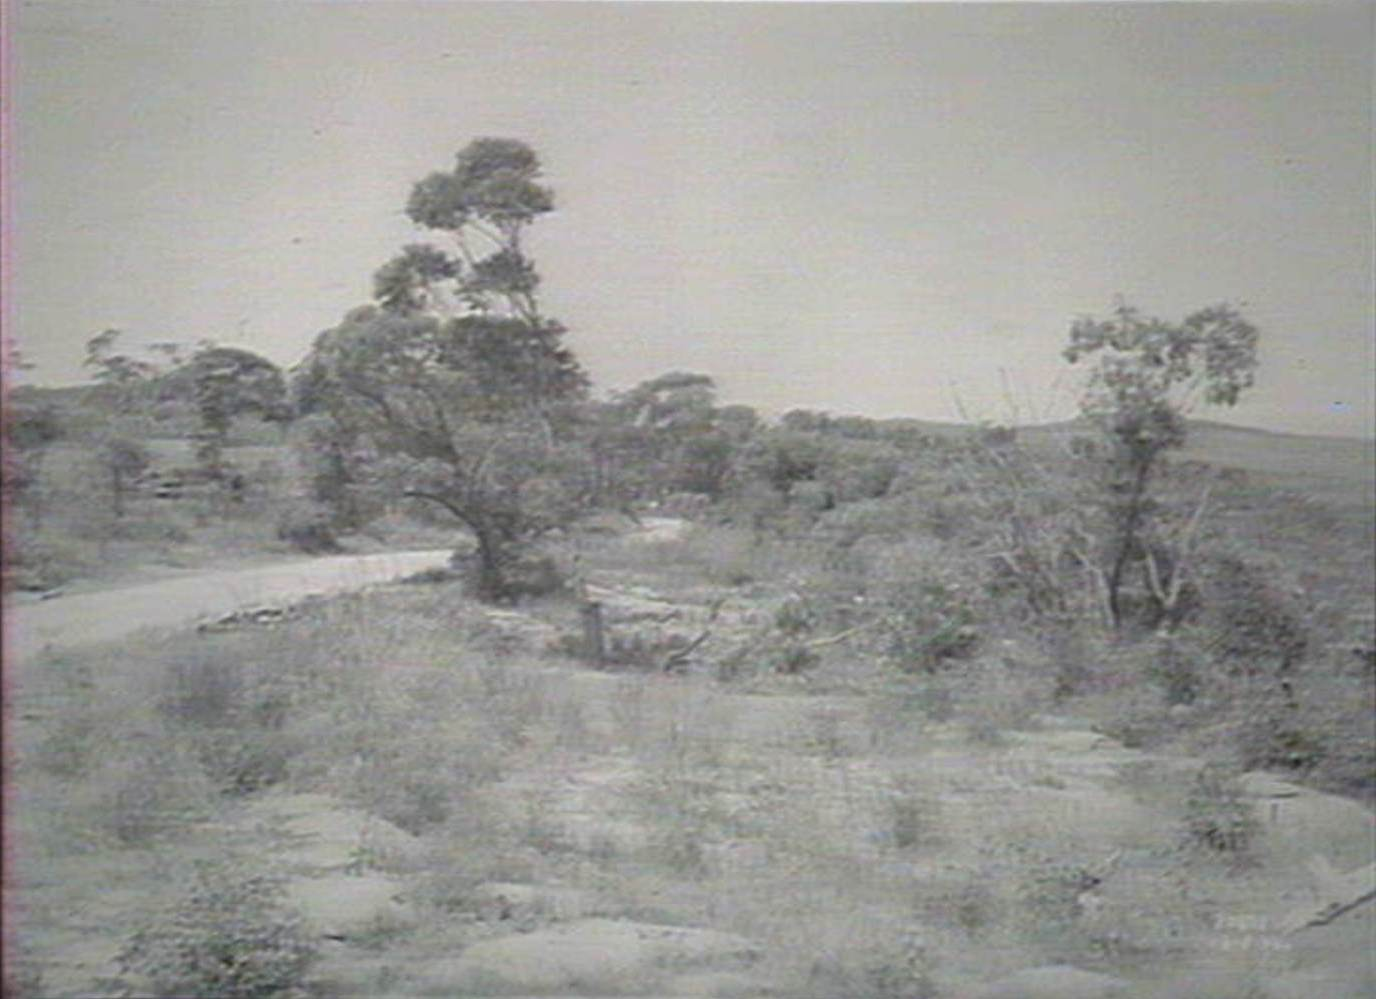 19fb0254b Looking east along main road 162 Feb 18th 1938. Image No.  d1 29543h